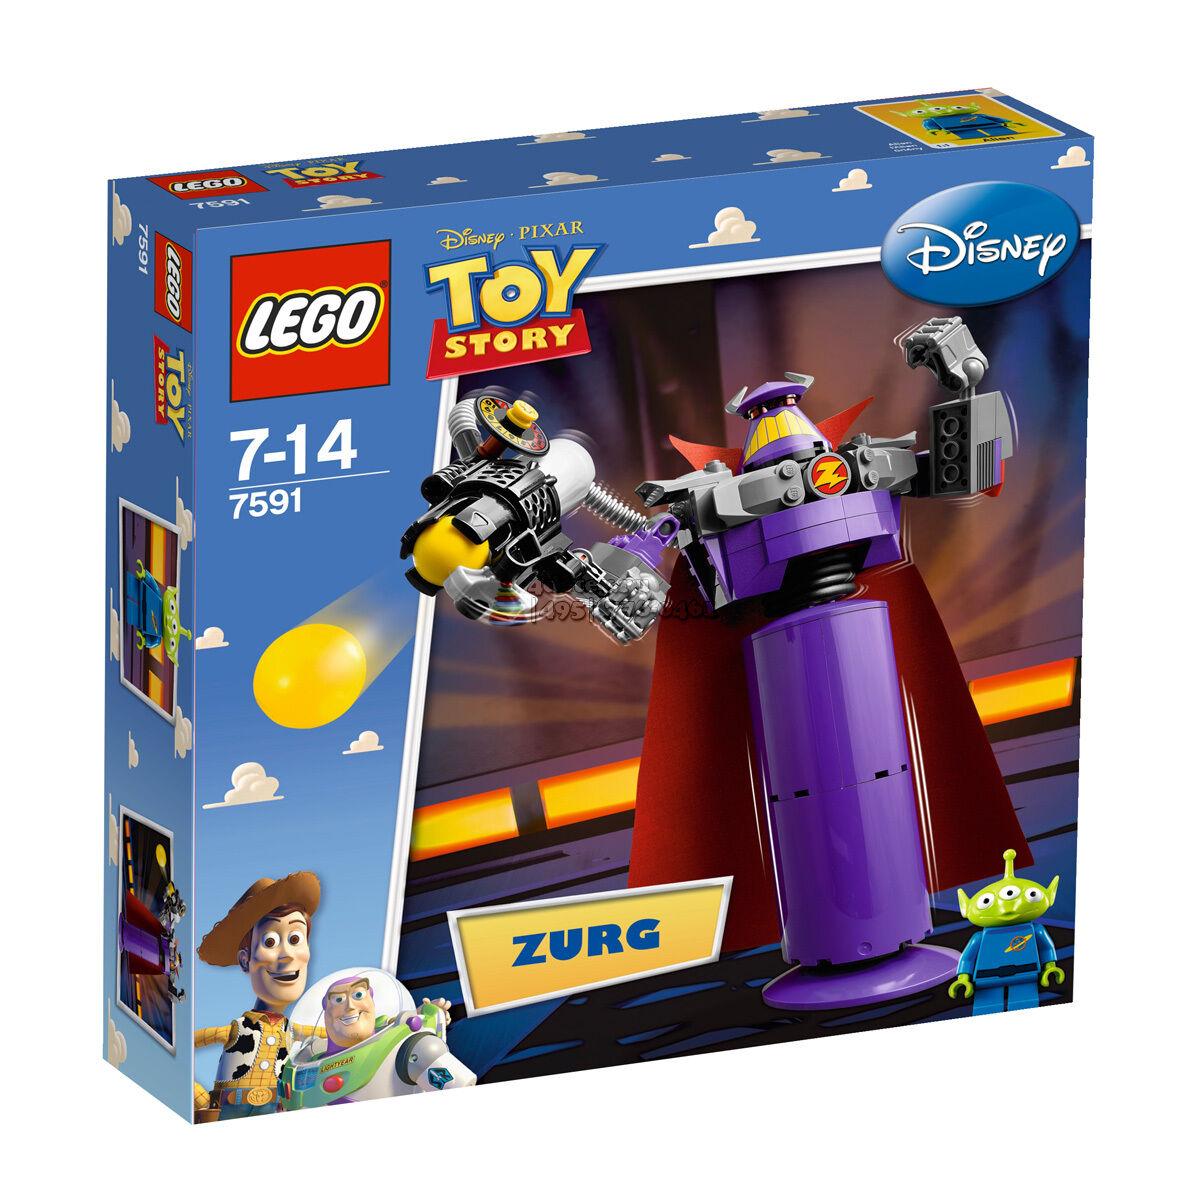 LEGO® Spielzeug Story 7591 Construct a Zurg NEU OVP_NEW MISB NRFB